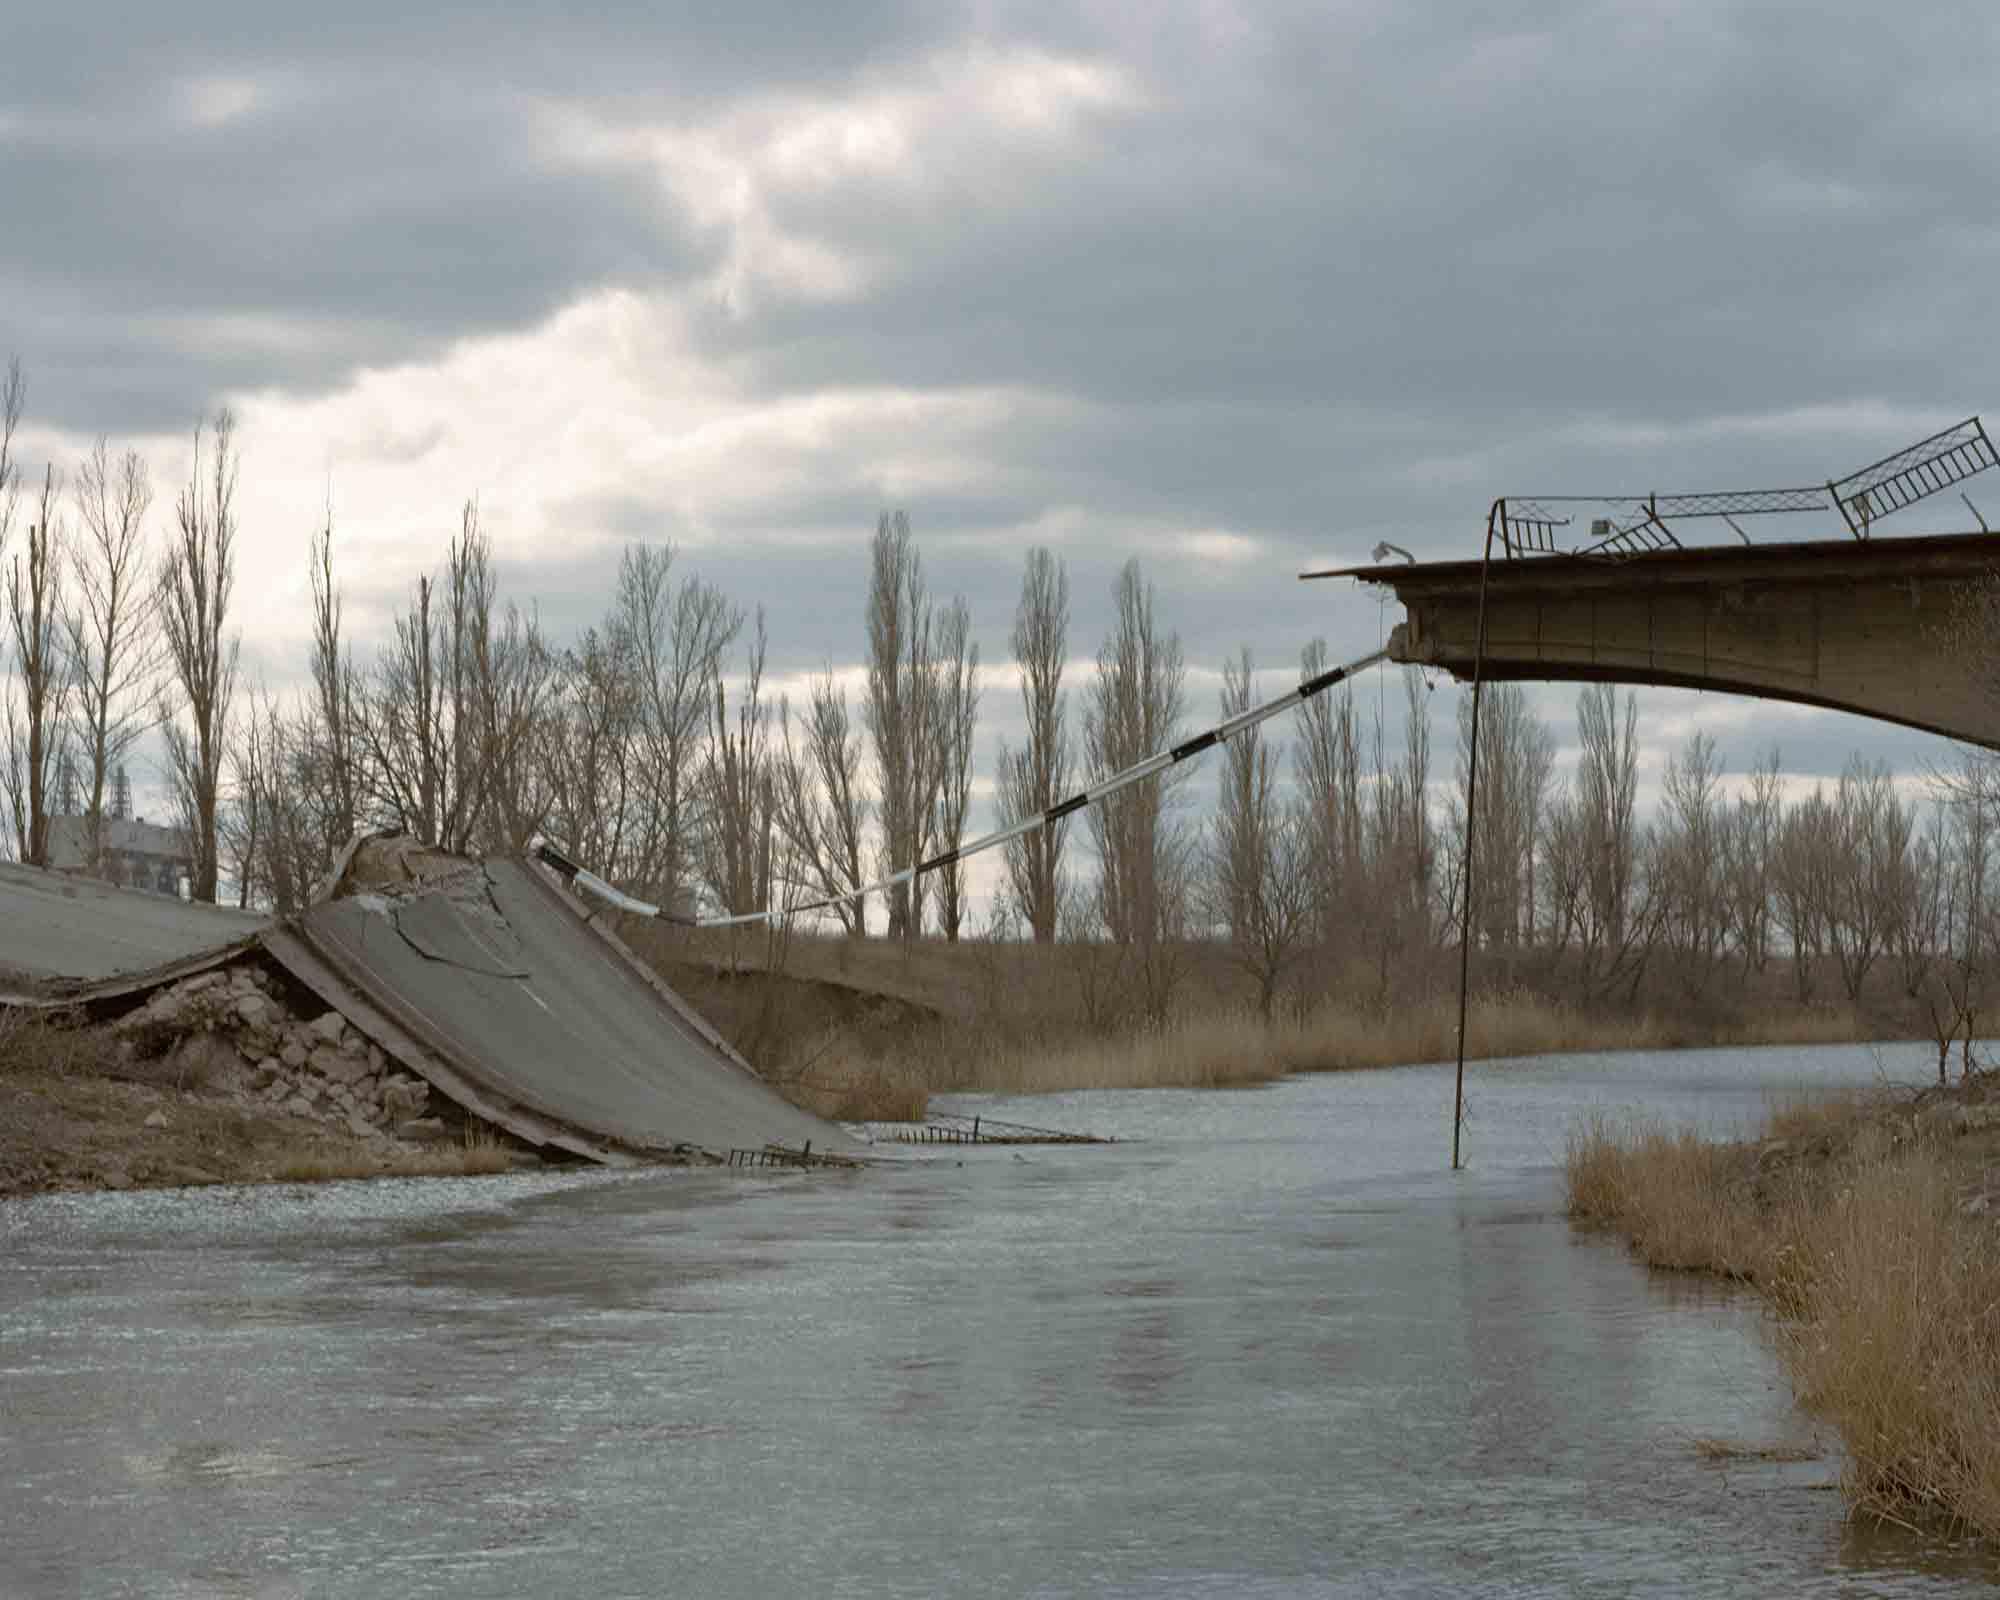 Wiktoria Wokciechowska,  A bridge in Semenivka – one of the first front lines . Semenivka, ATO zone (war zone), Ukraine, March 2015. Courtesy of the artist.